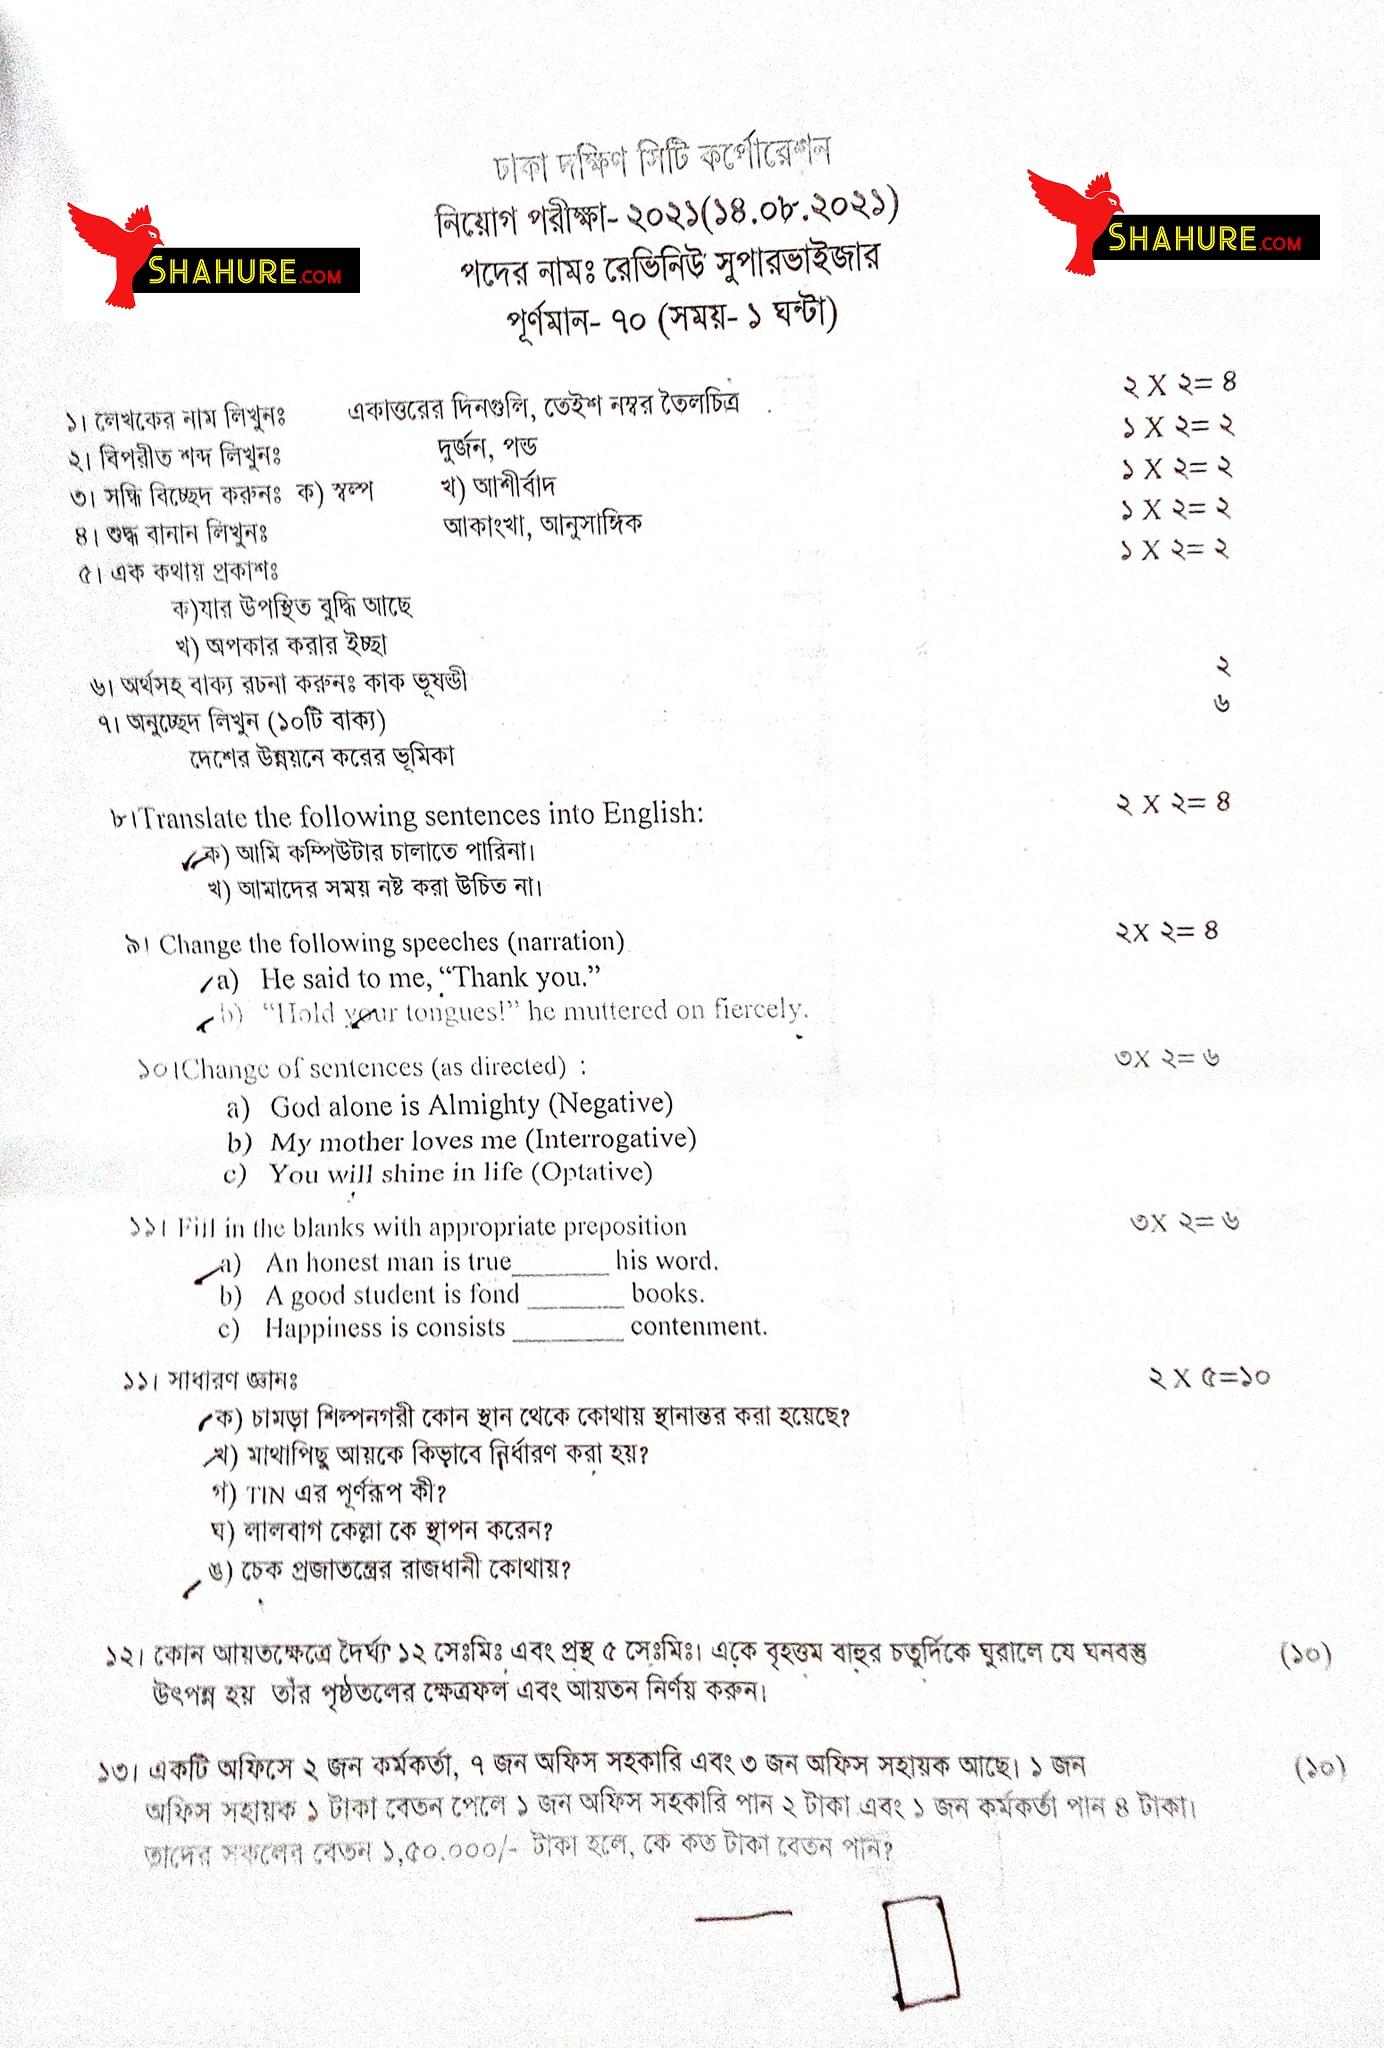 Dhaka South City Corporation (DSCC) Exam Question 2021